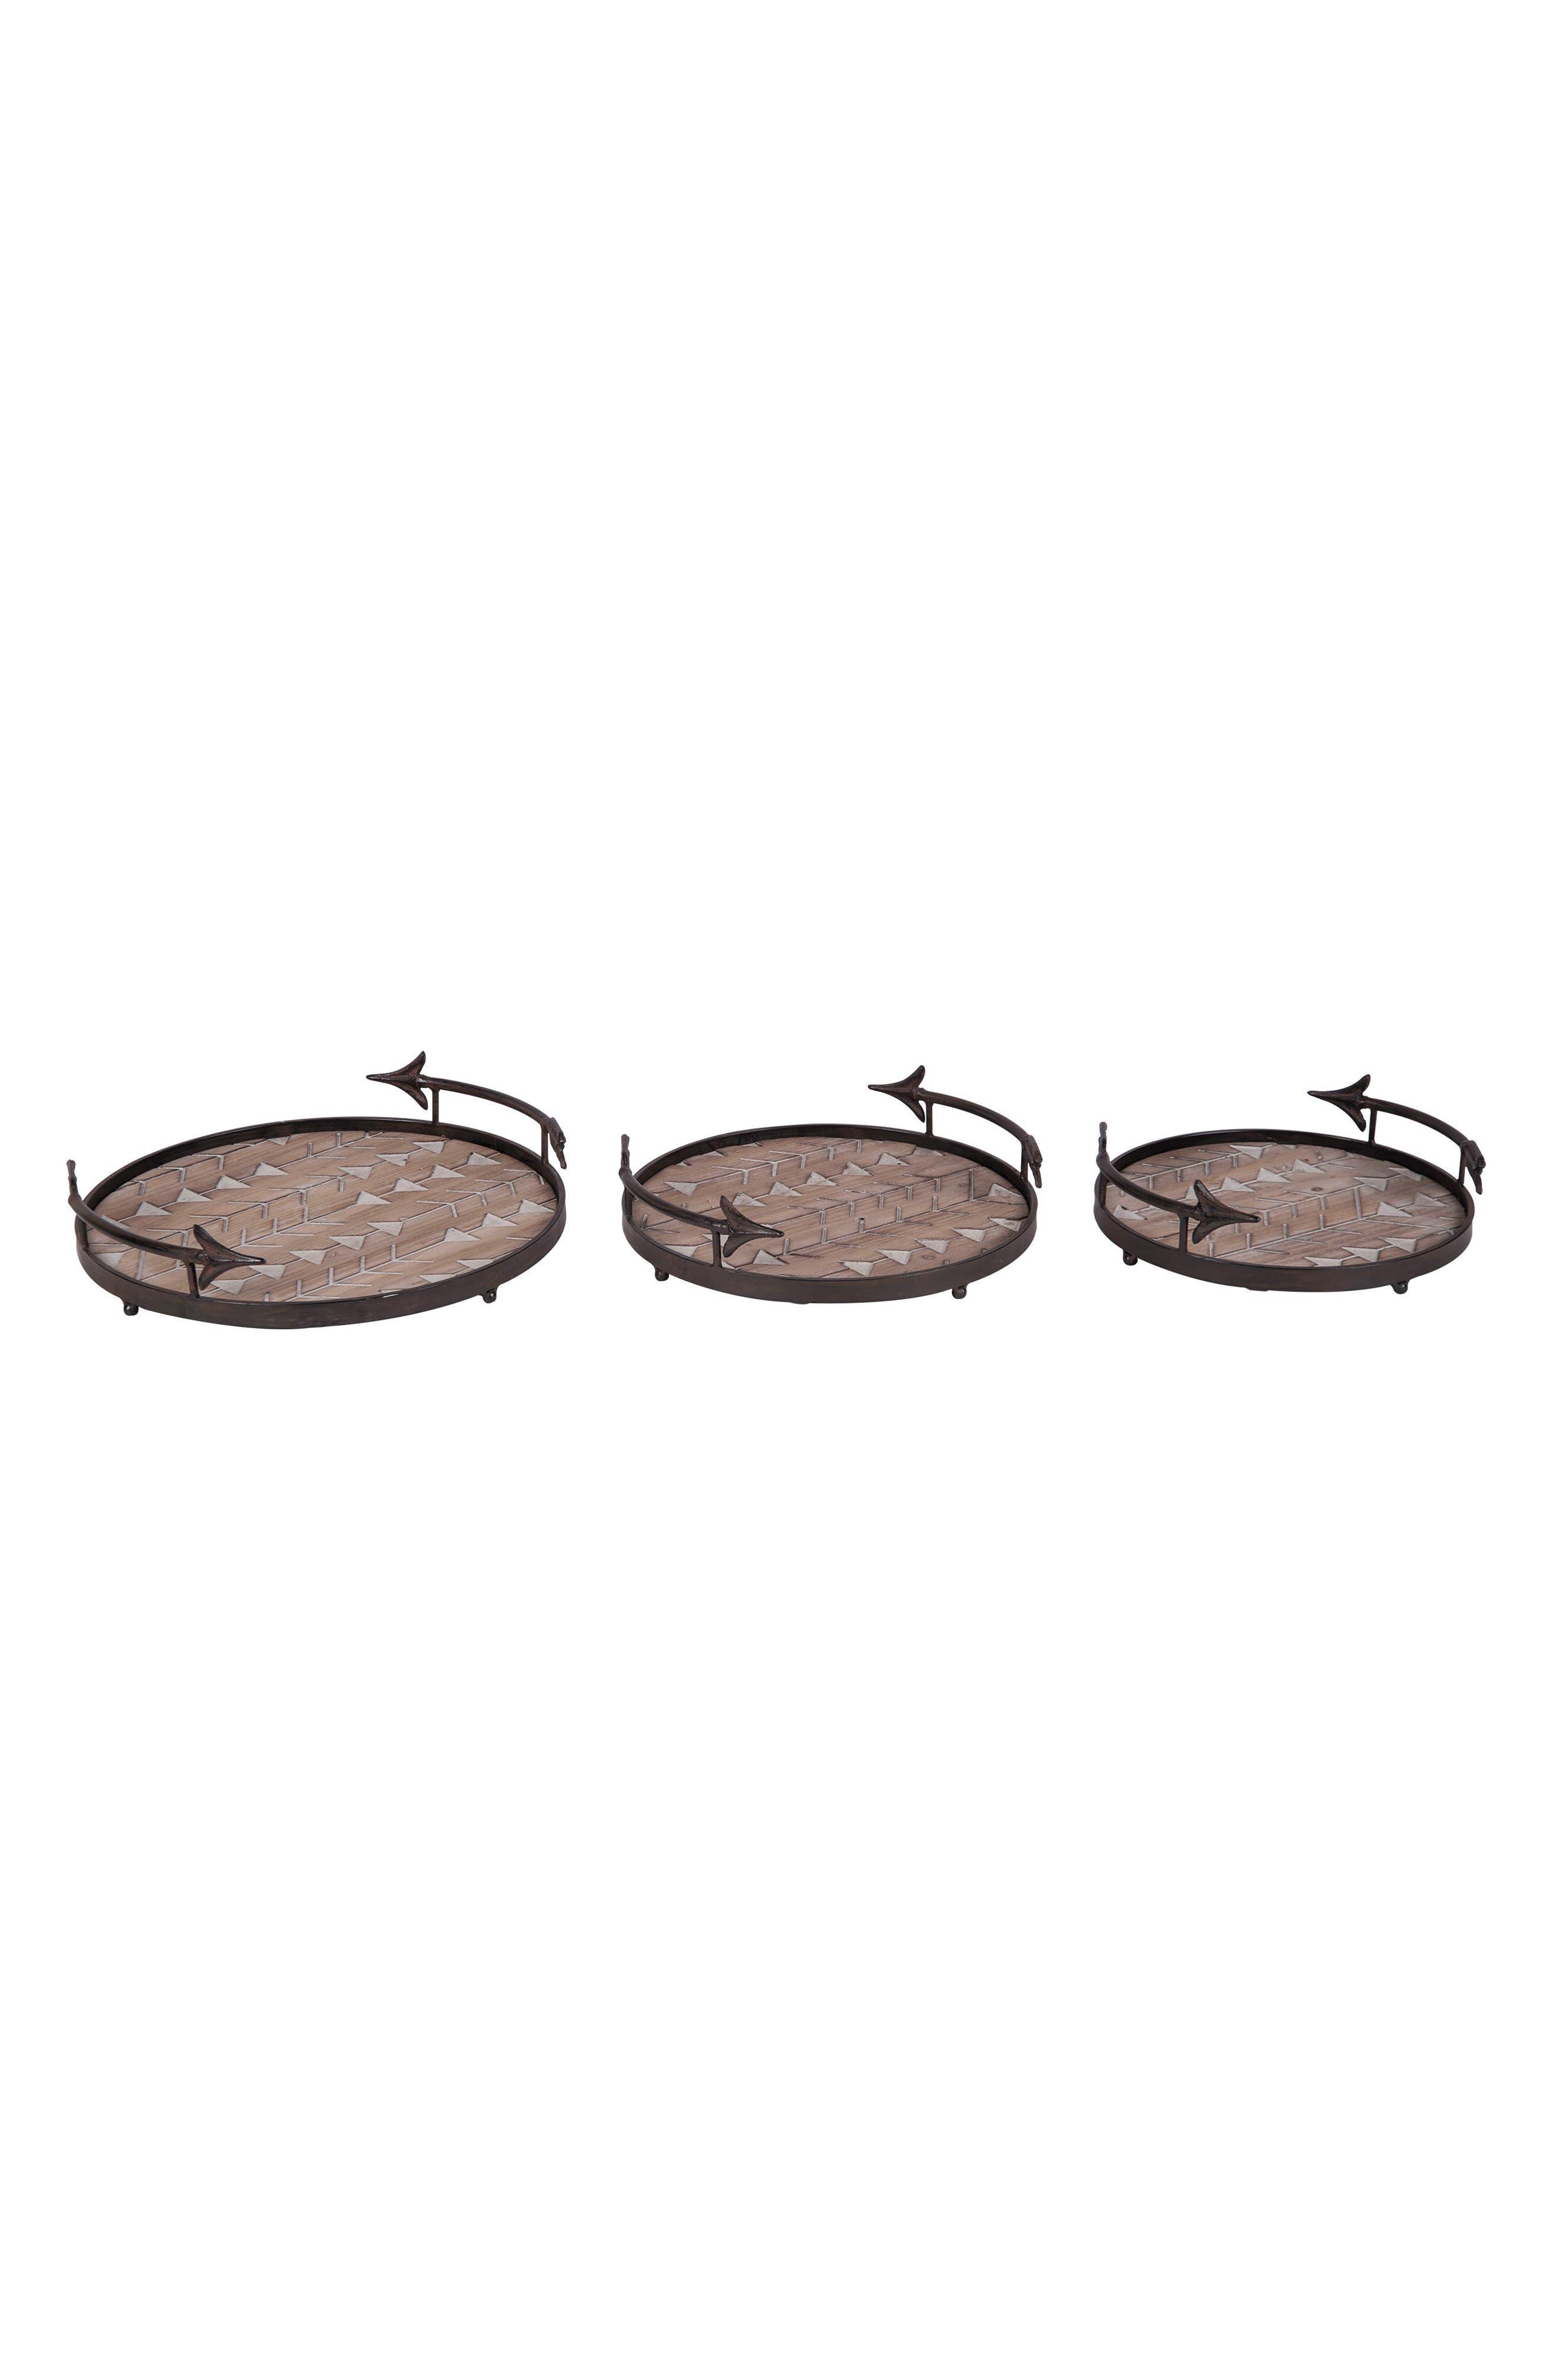 Arrow Set of 3 Nesting Trays,                             Main thumbnail 1, color,                             Metal/ Wood